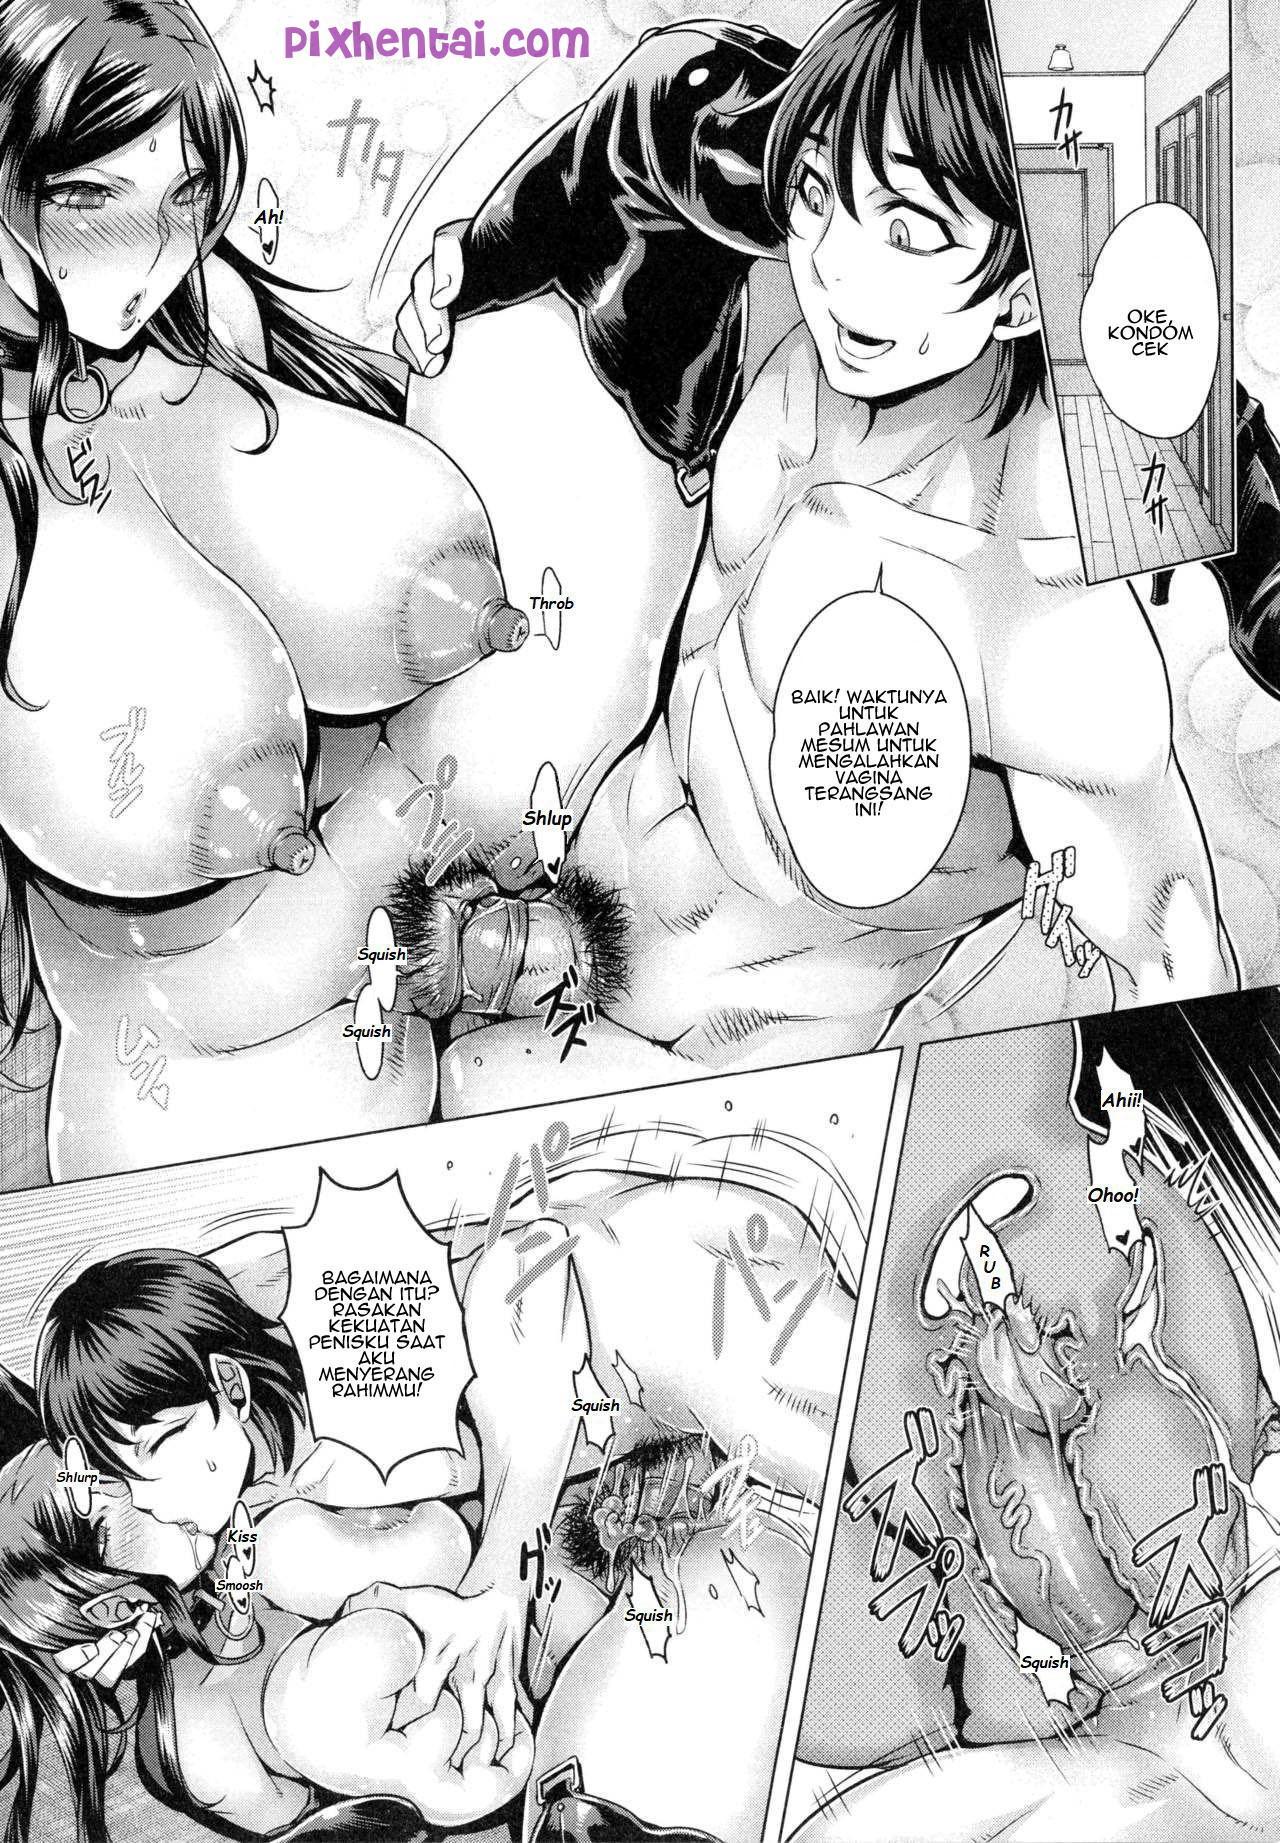 Komik hentai xxx manga sex bokep entot ibu kost saat cosplay 16